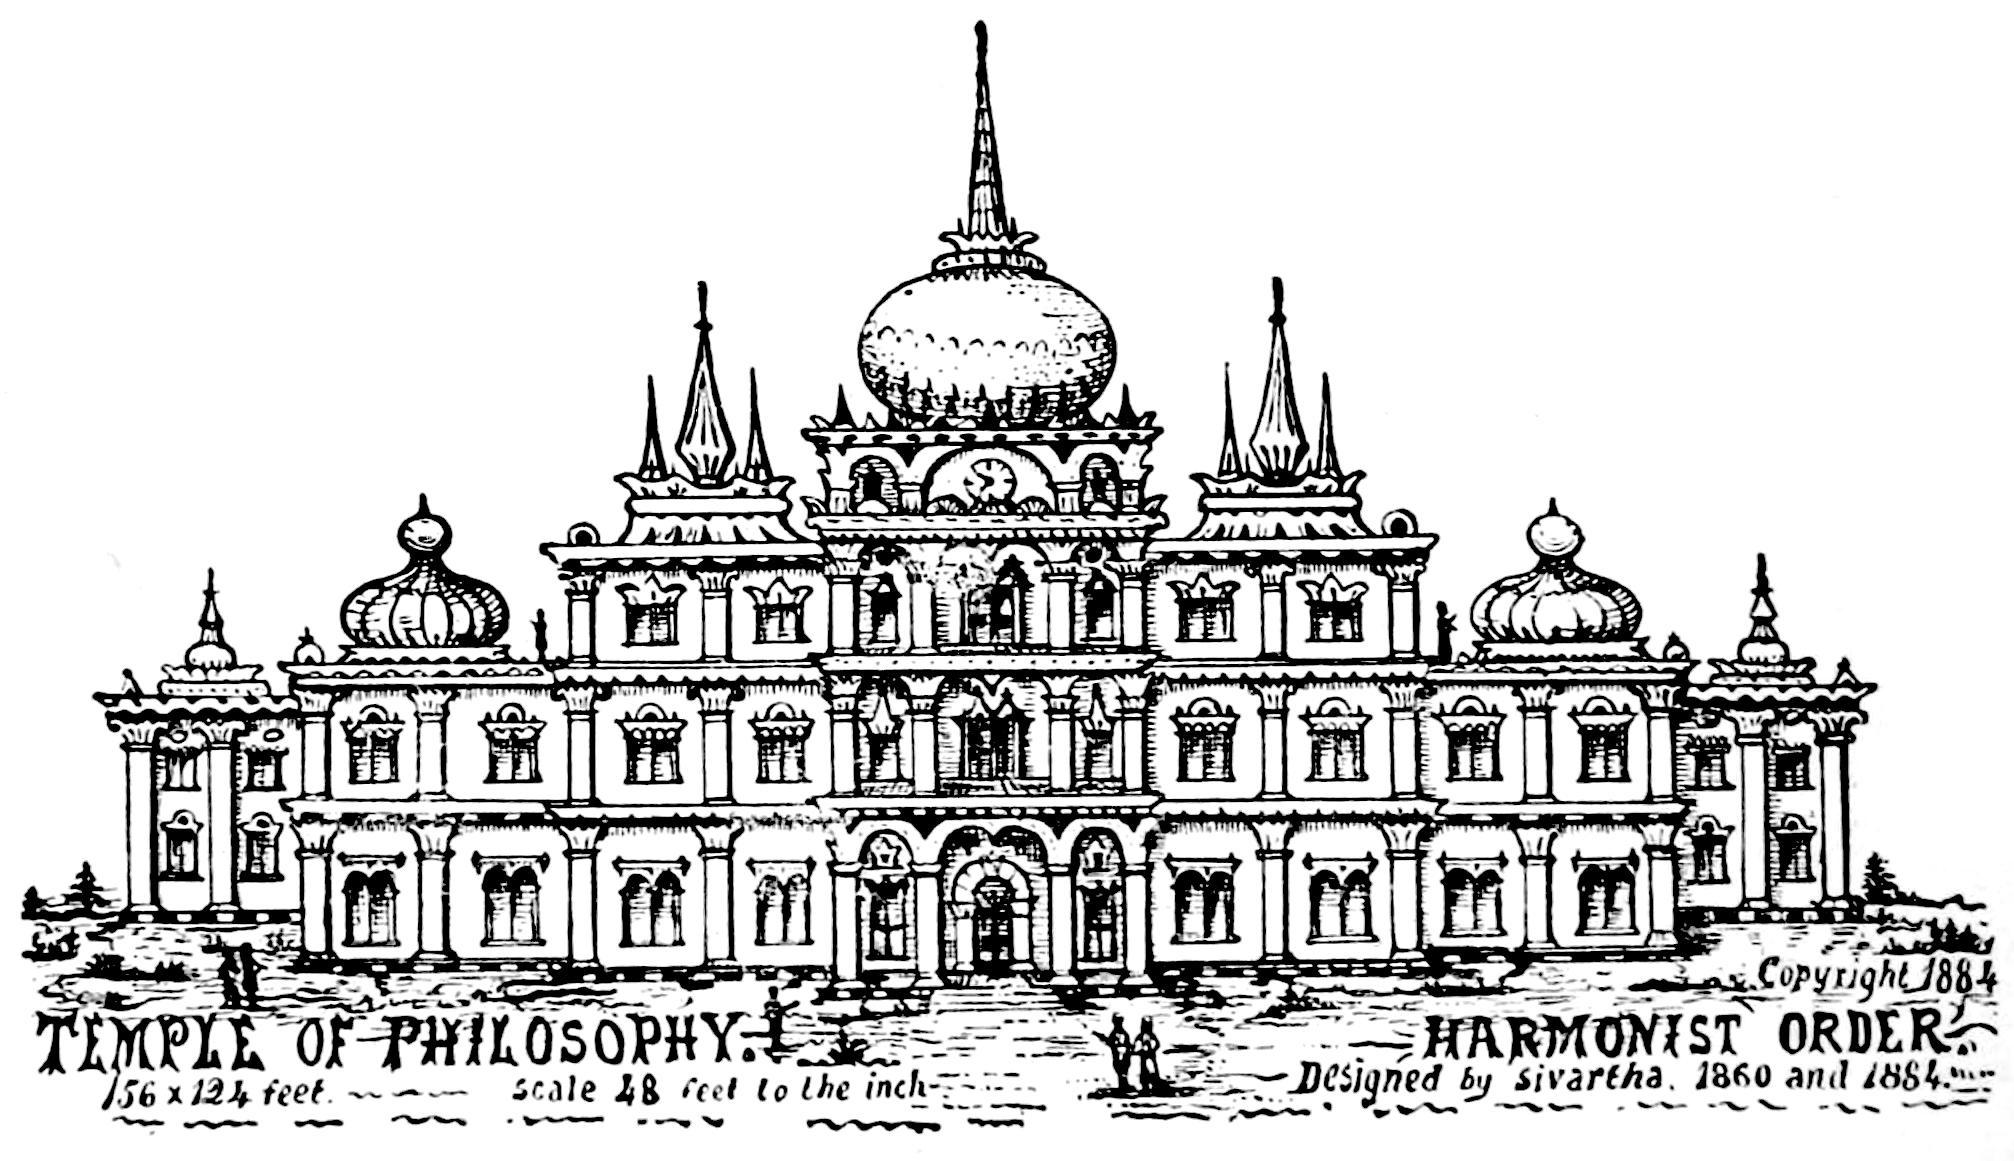 90_Temple_of_Philosophy.jpg